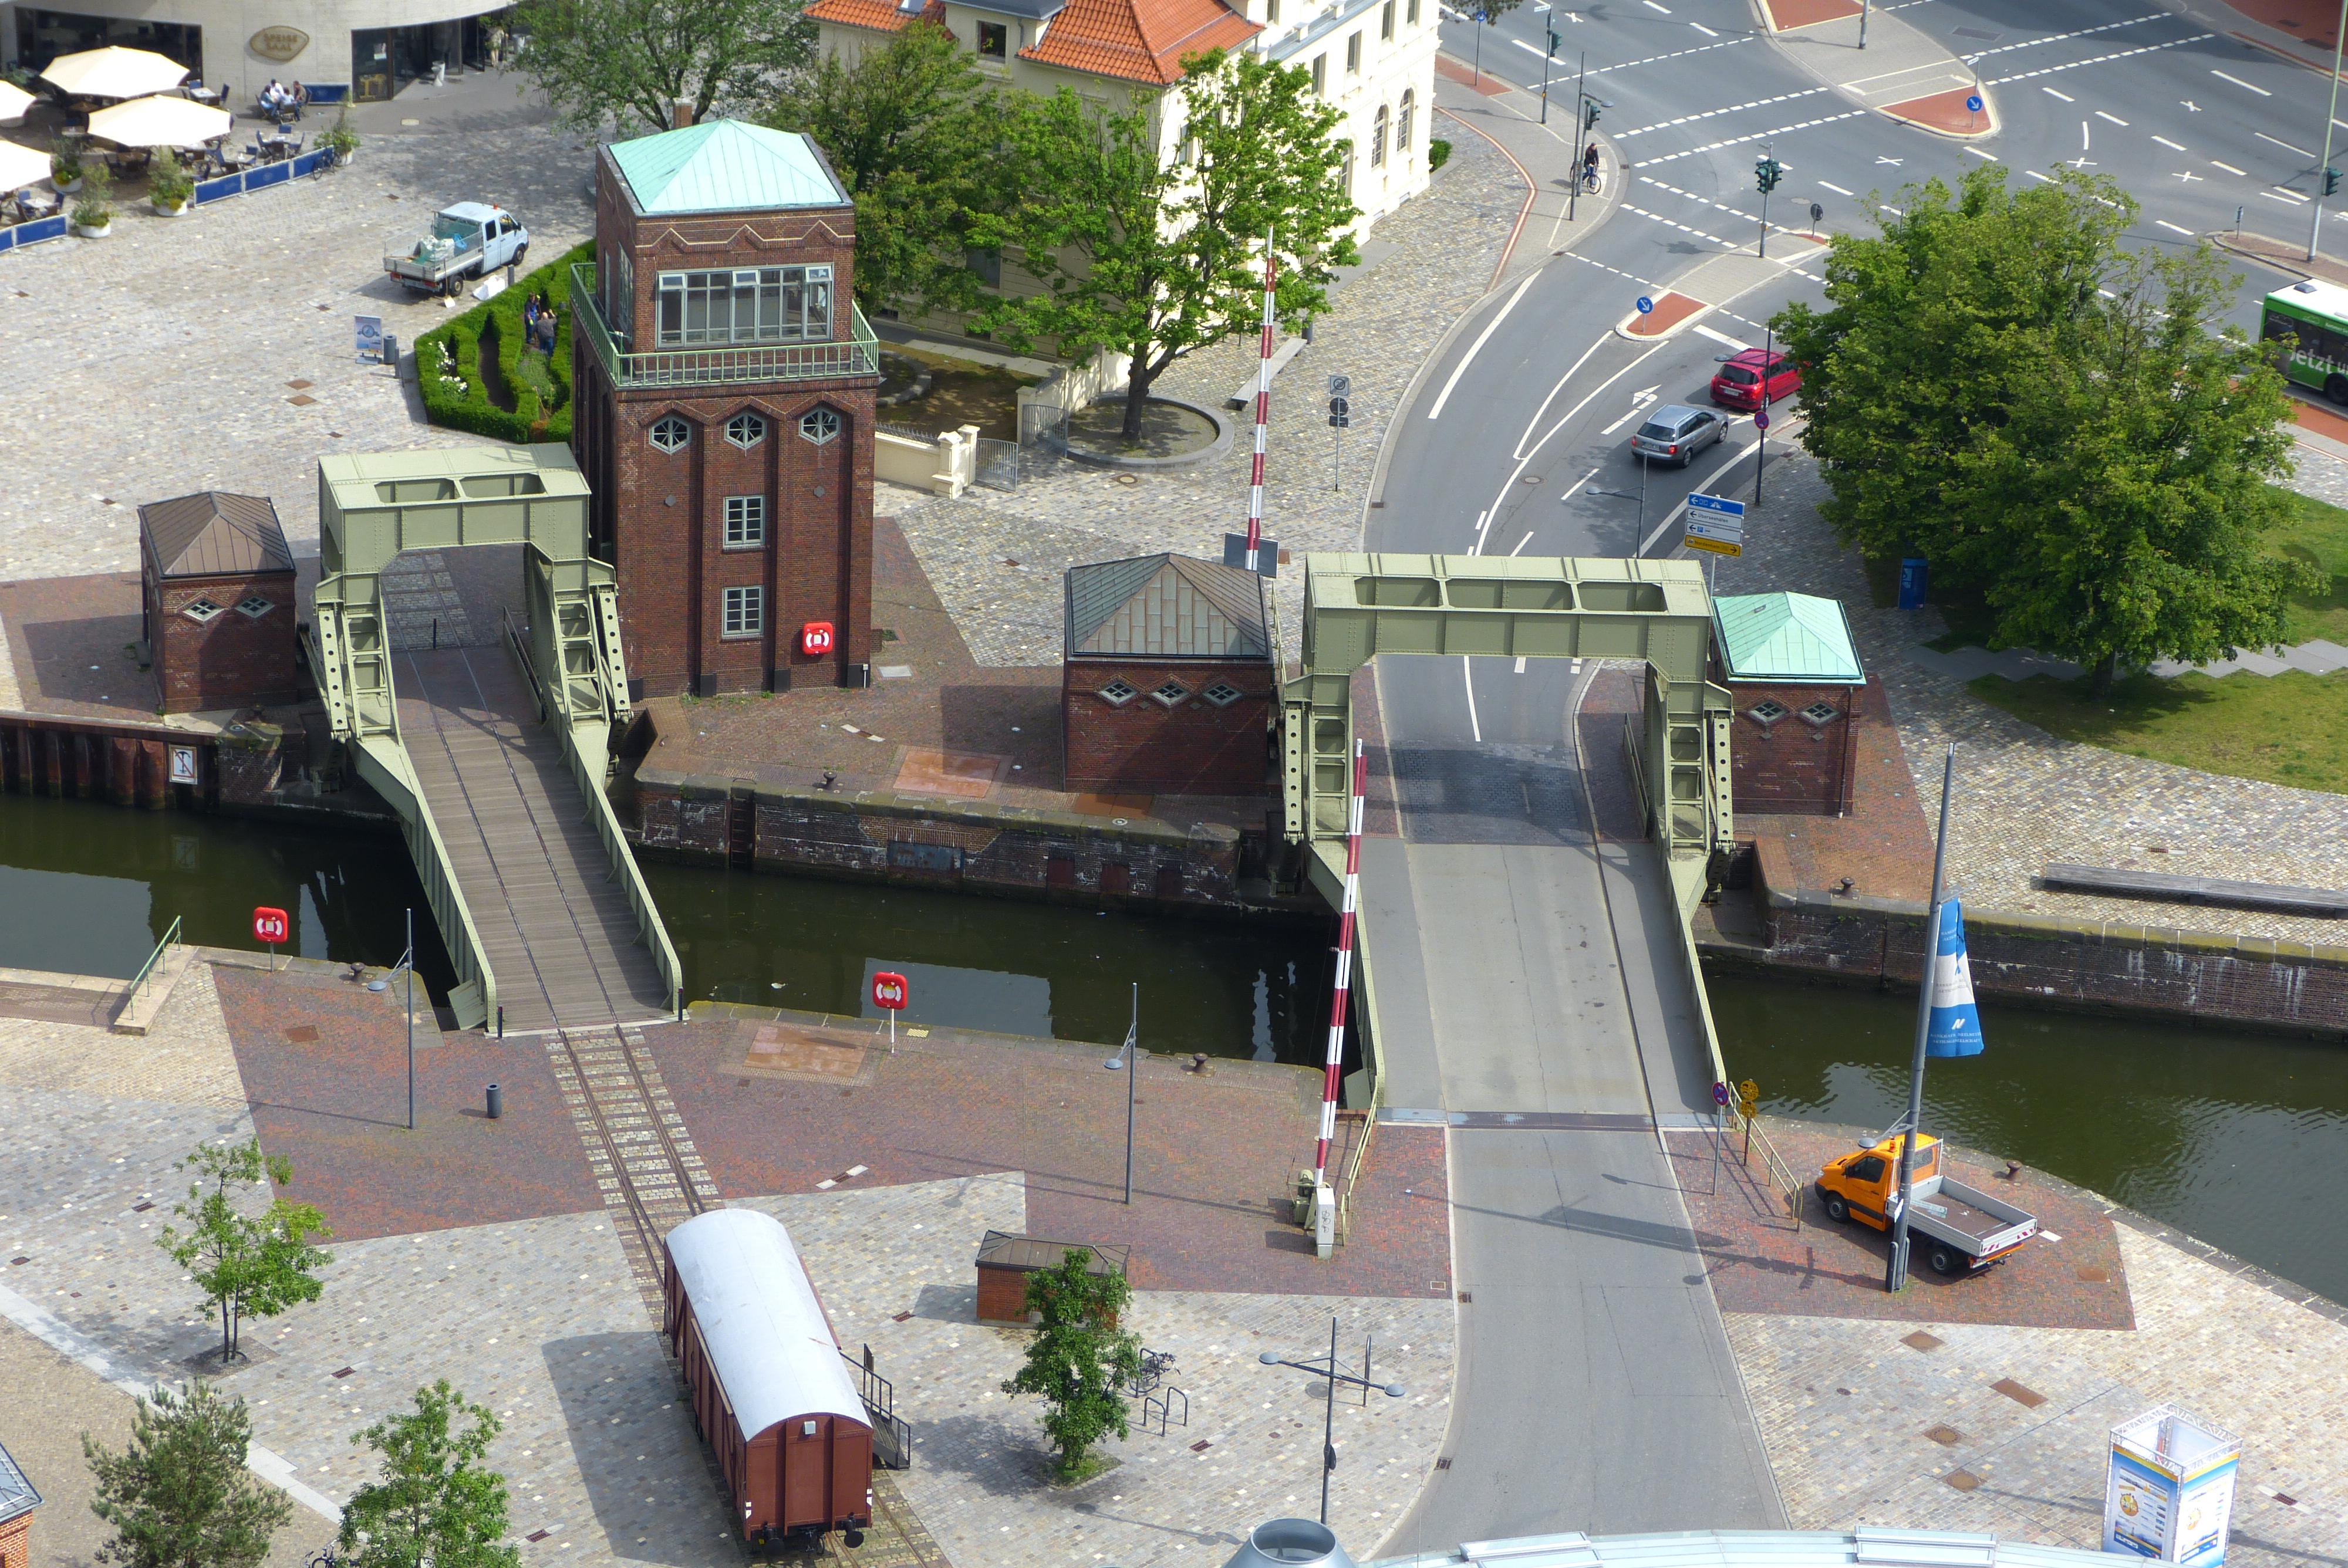 Meier City Hotel Munchen